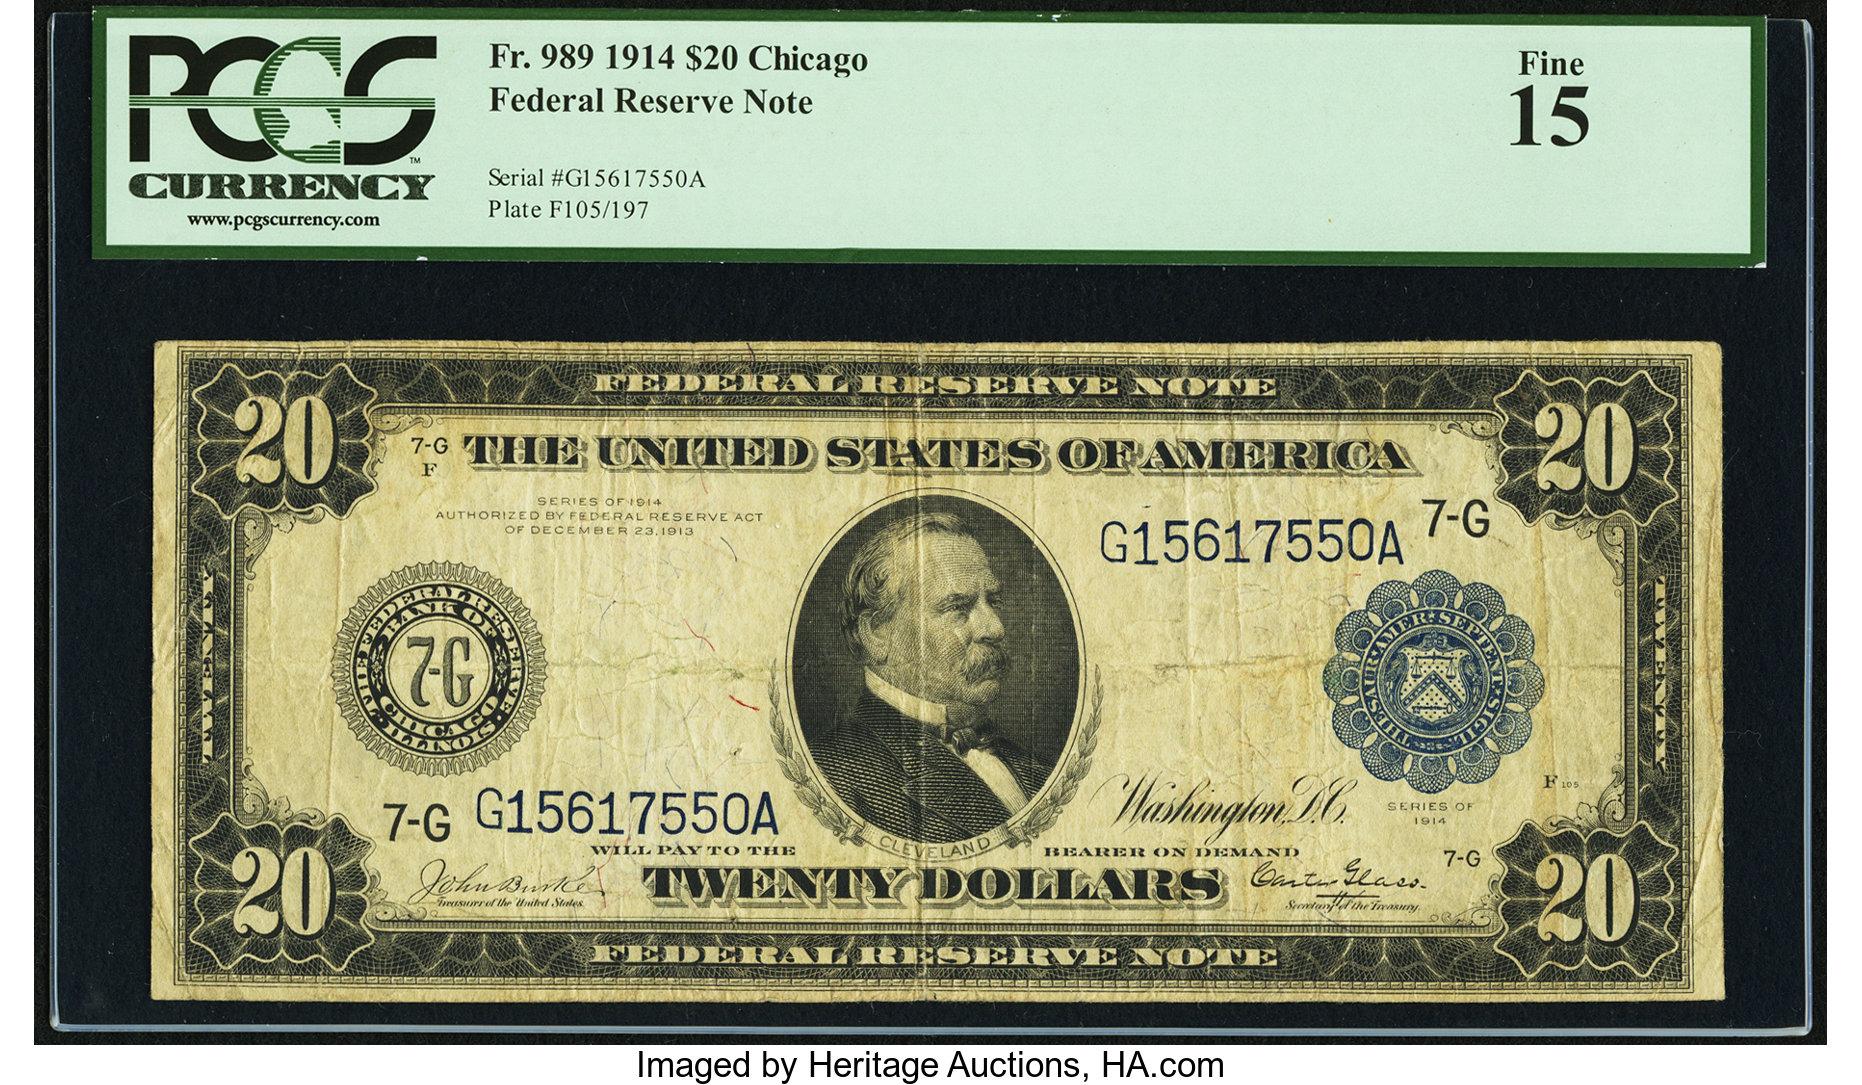 sample image for Fr.989 $20 Chicago